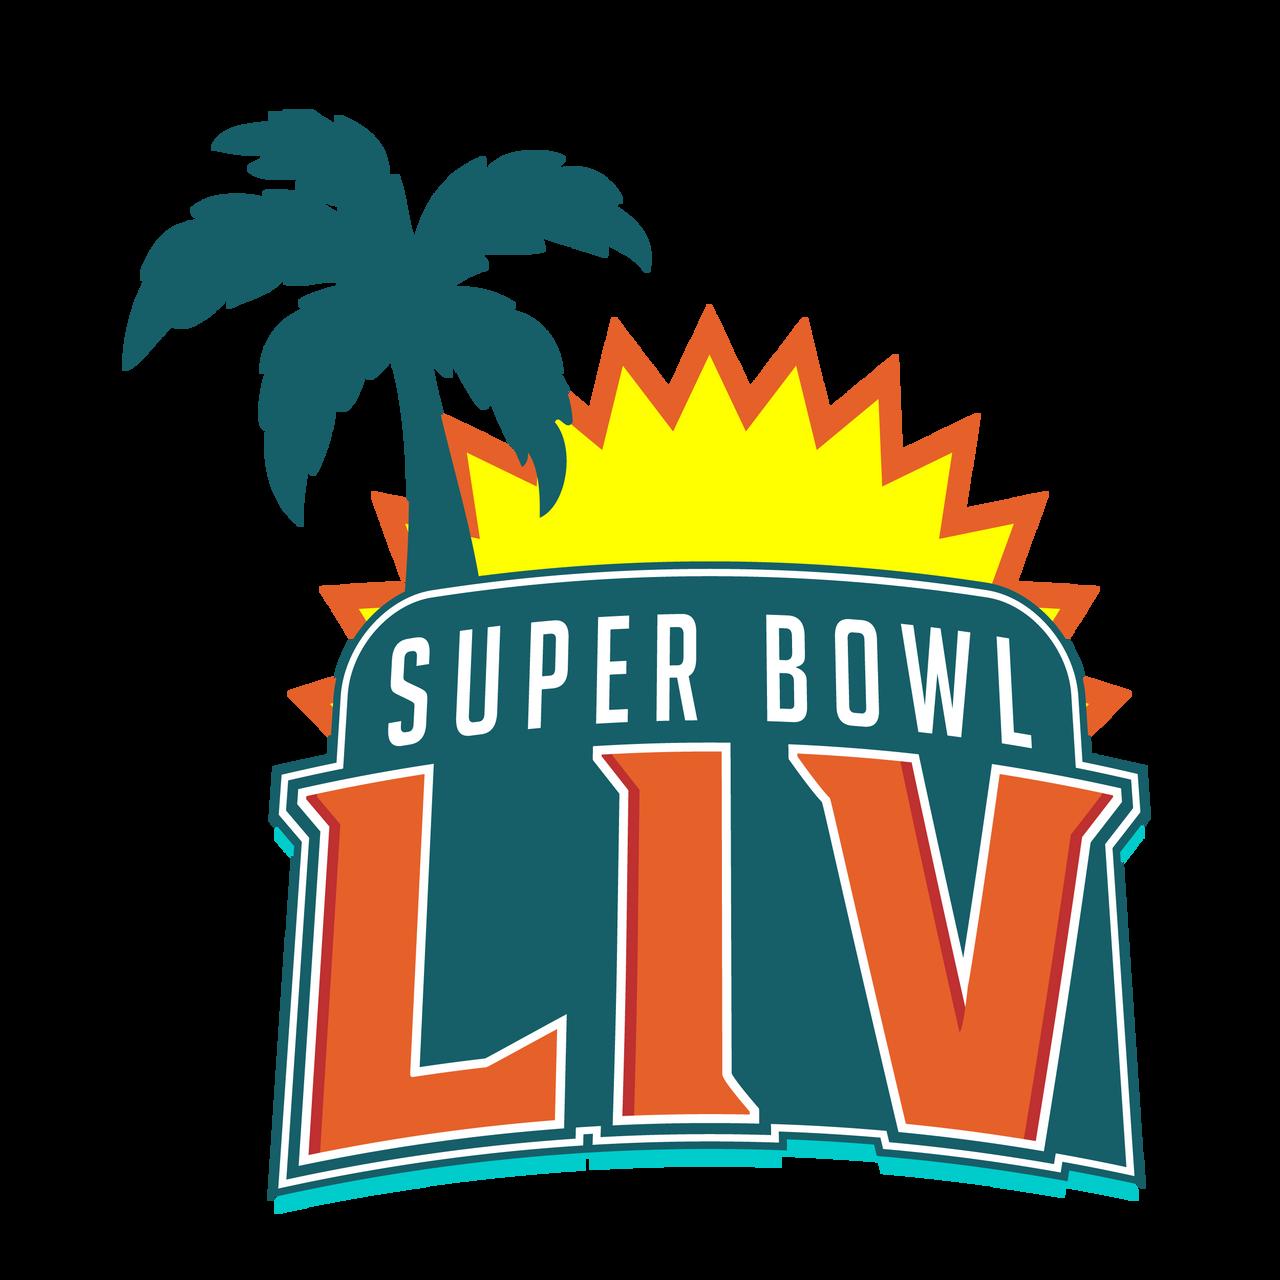 Super Bowl Liv Logo By Almcinnis On Deviantart Super Bowl Super Bowl Sunday Super Bowl Show